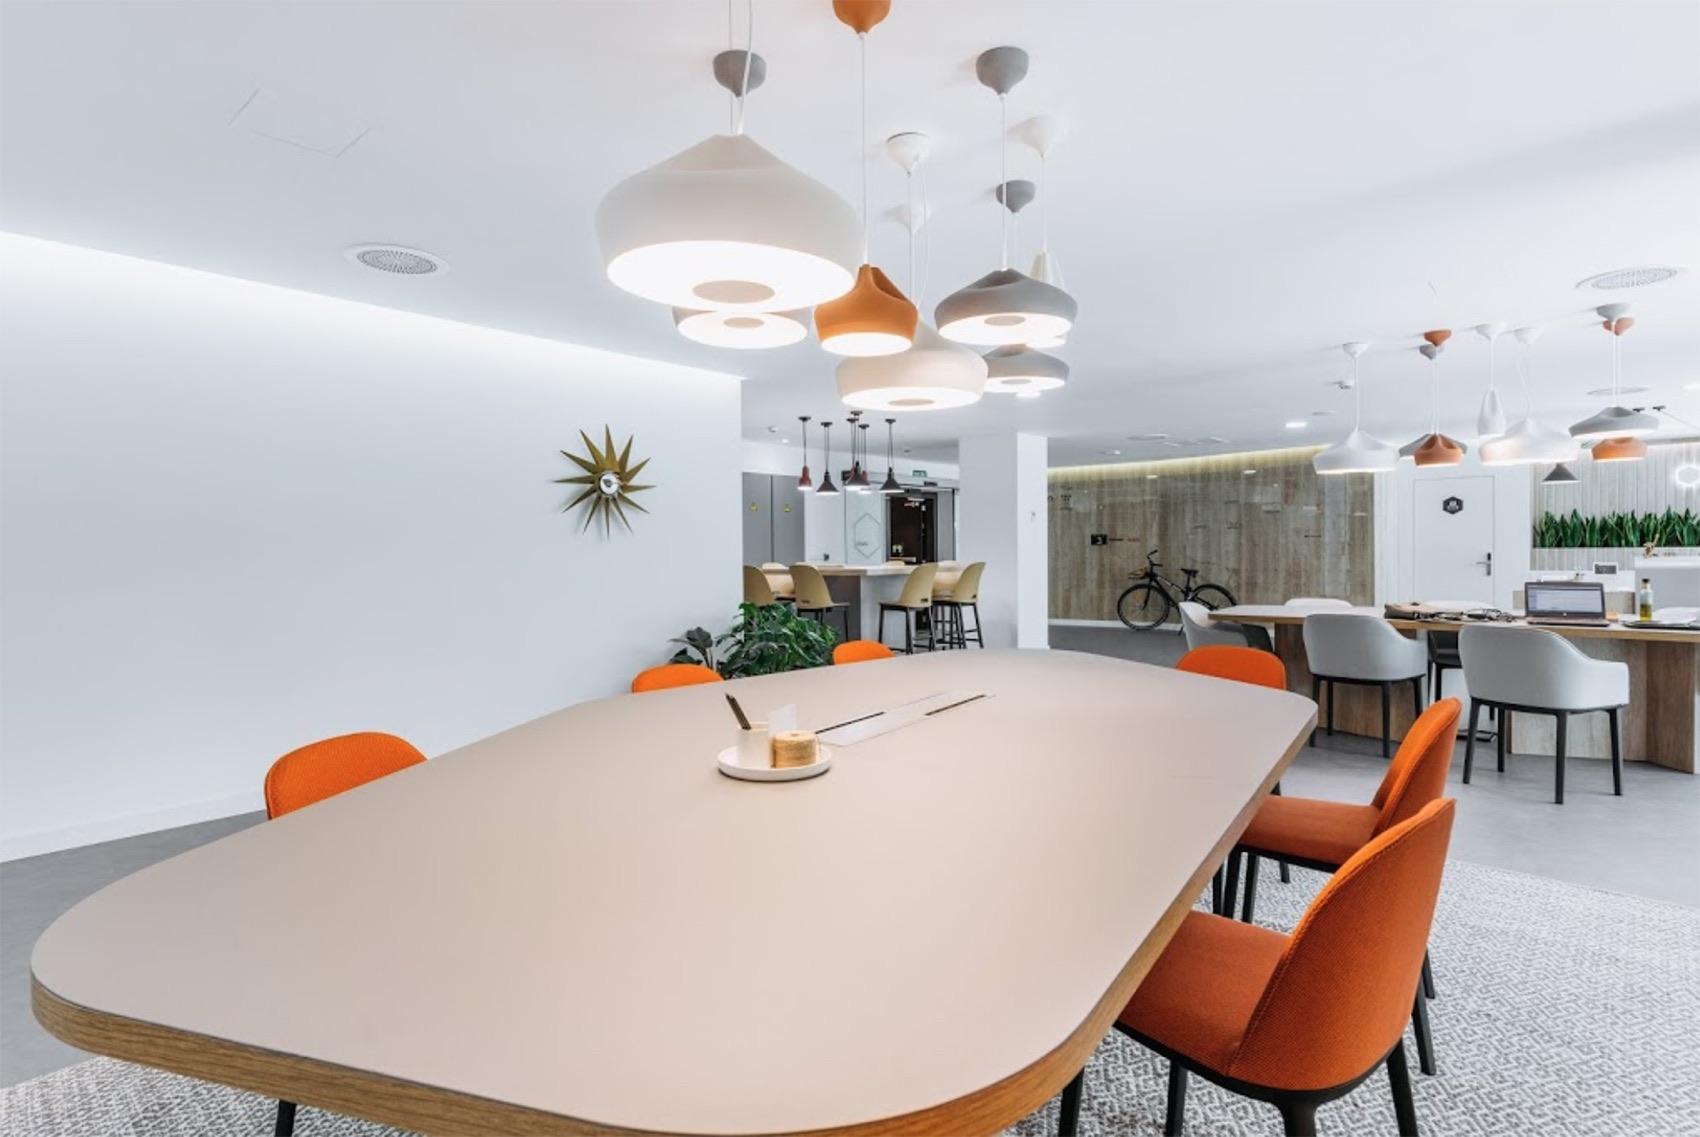 spaces-attocha-coworking-5